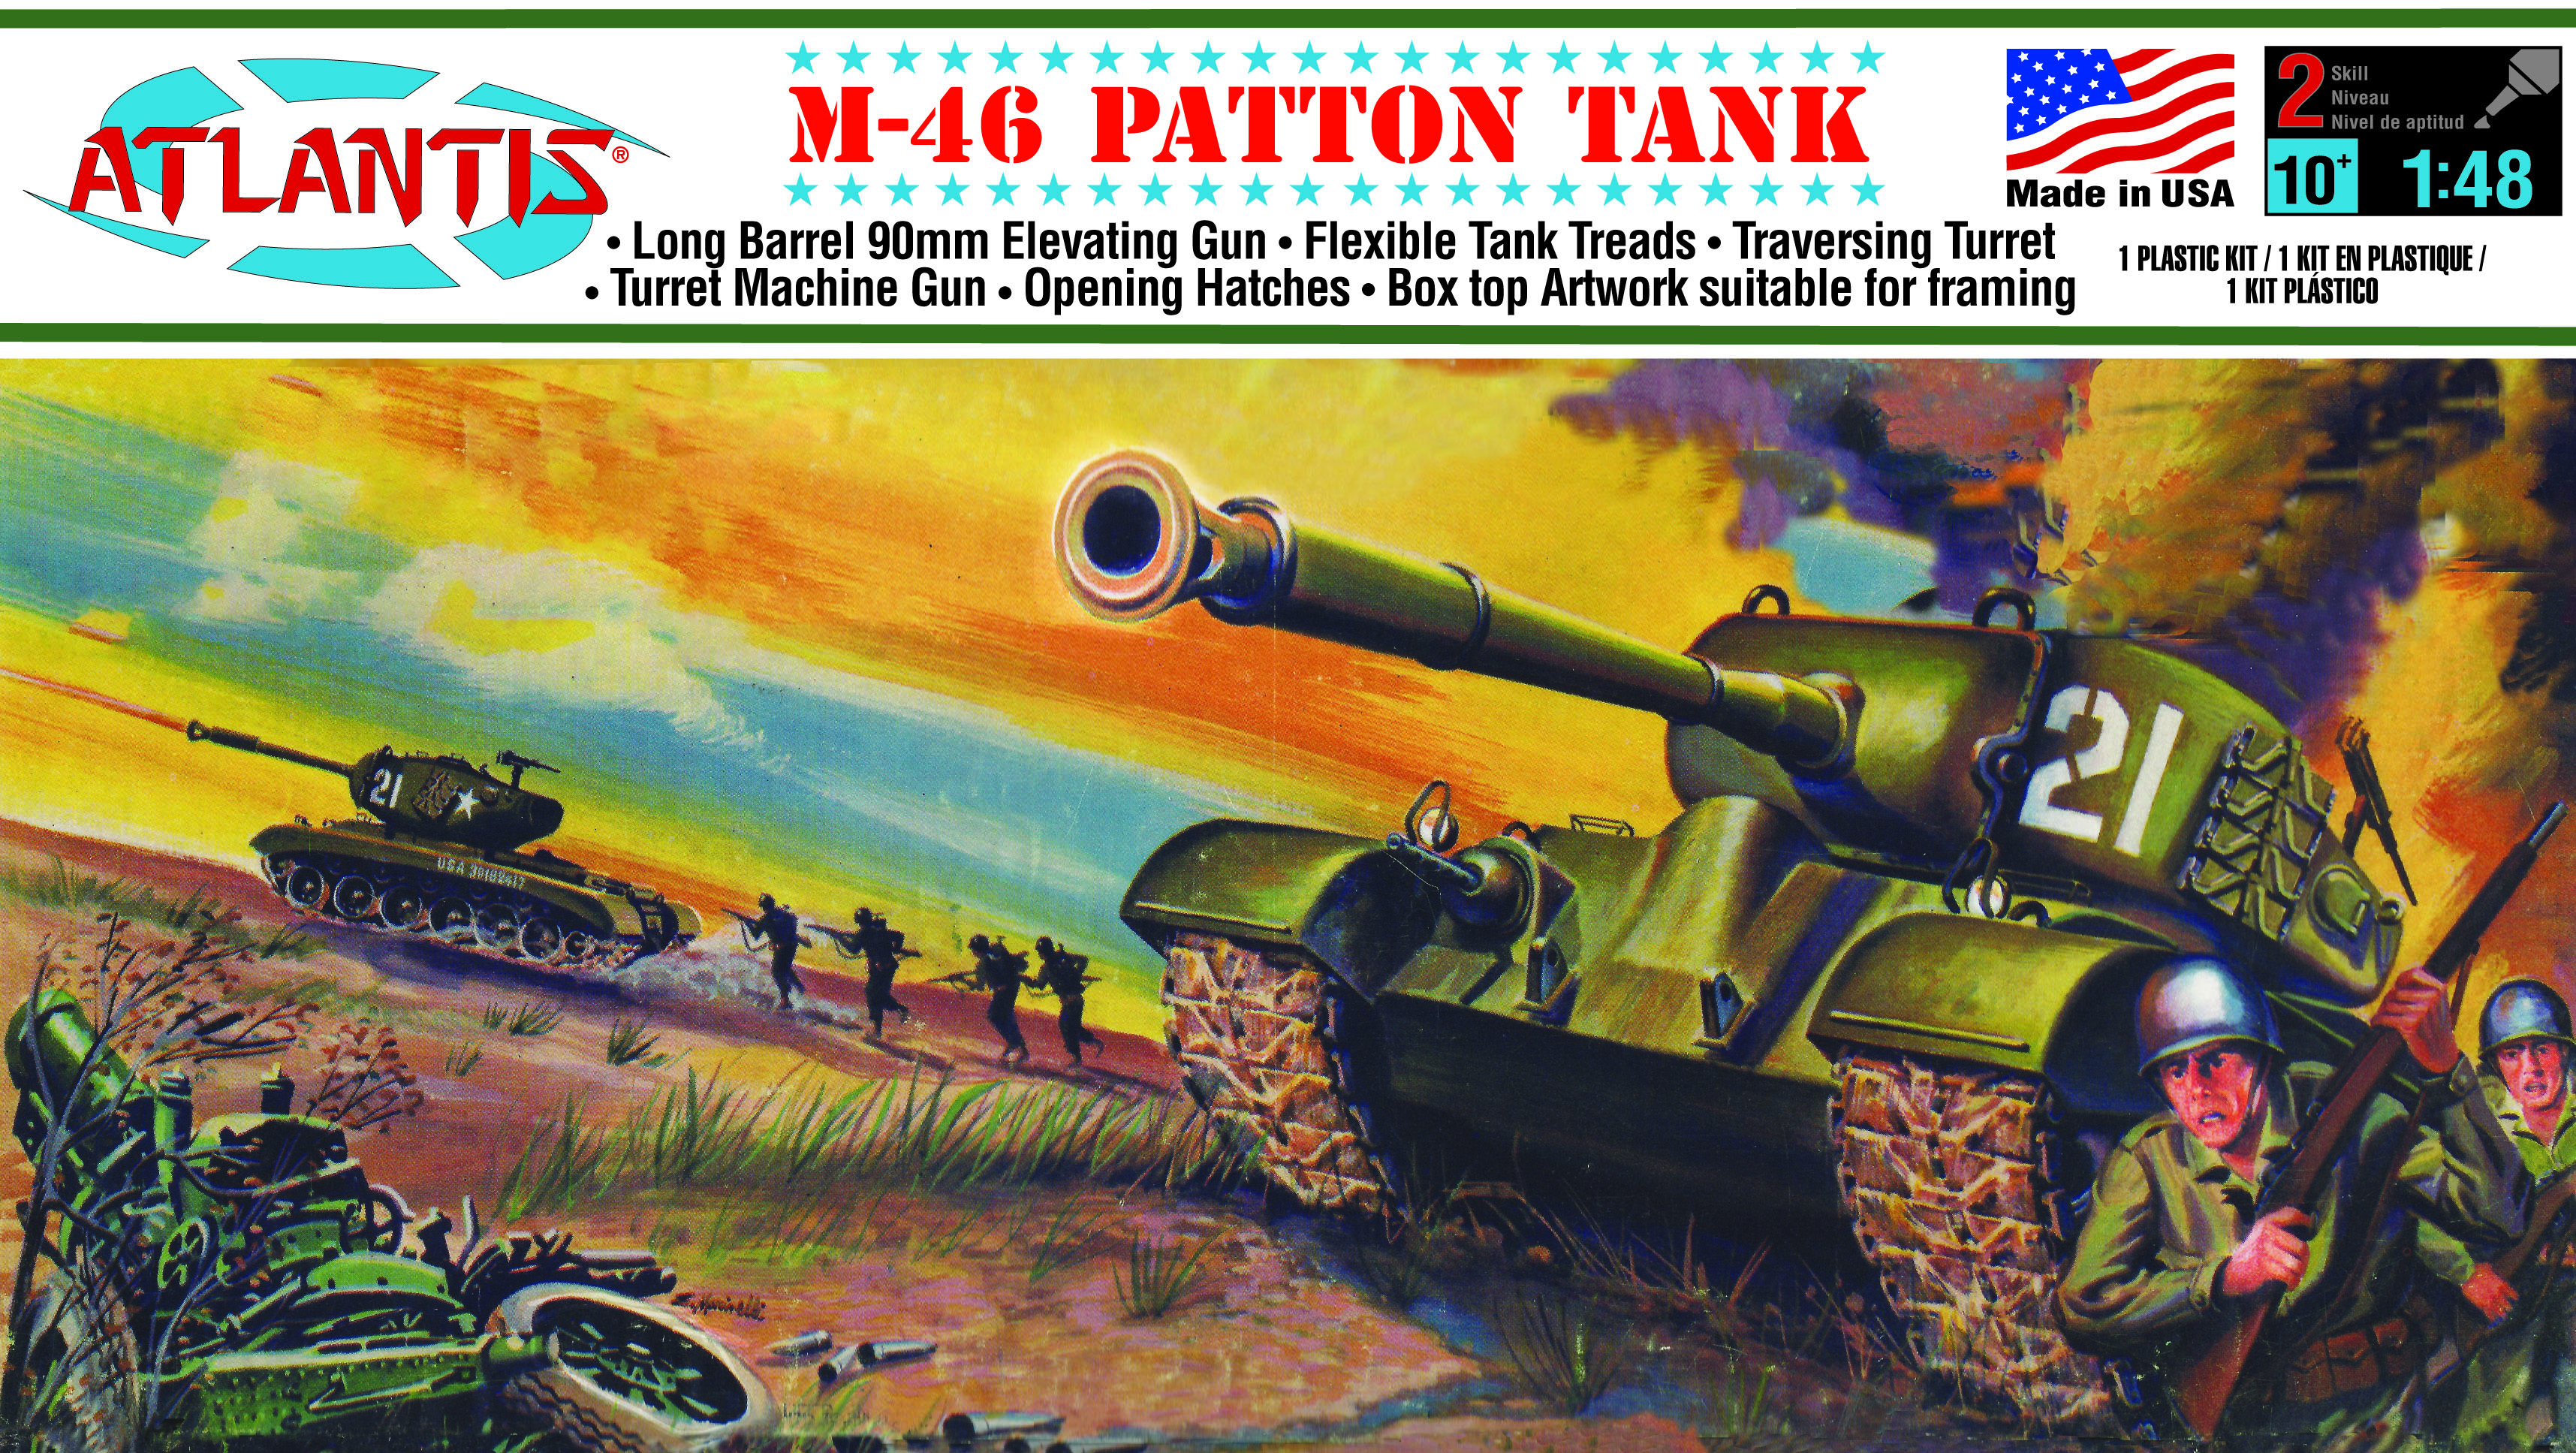 Atlantis 1/48 M-46 Patton Tank w/ Figures & Decals